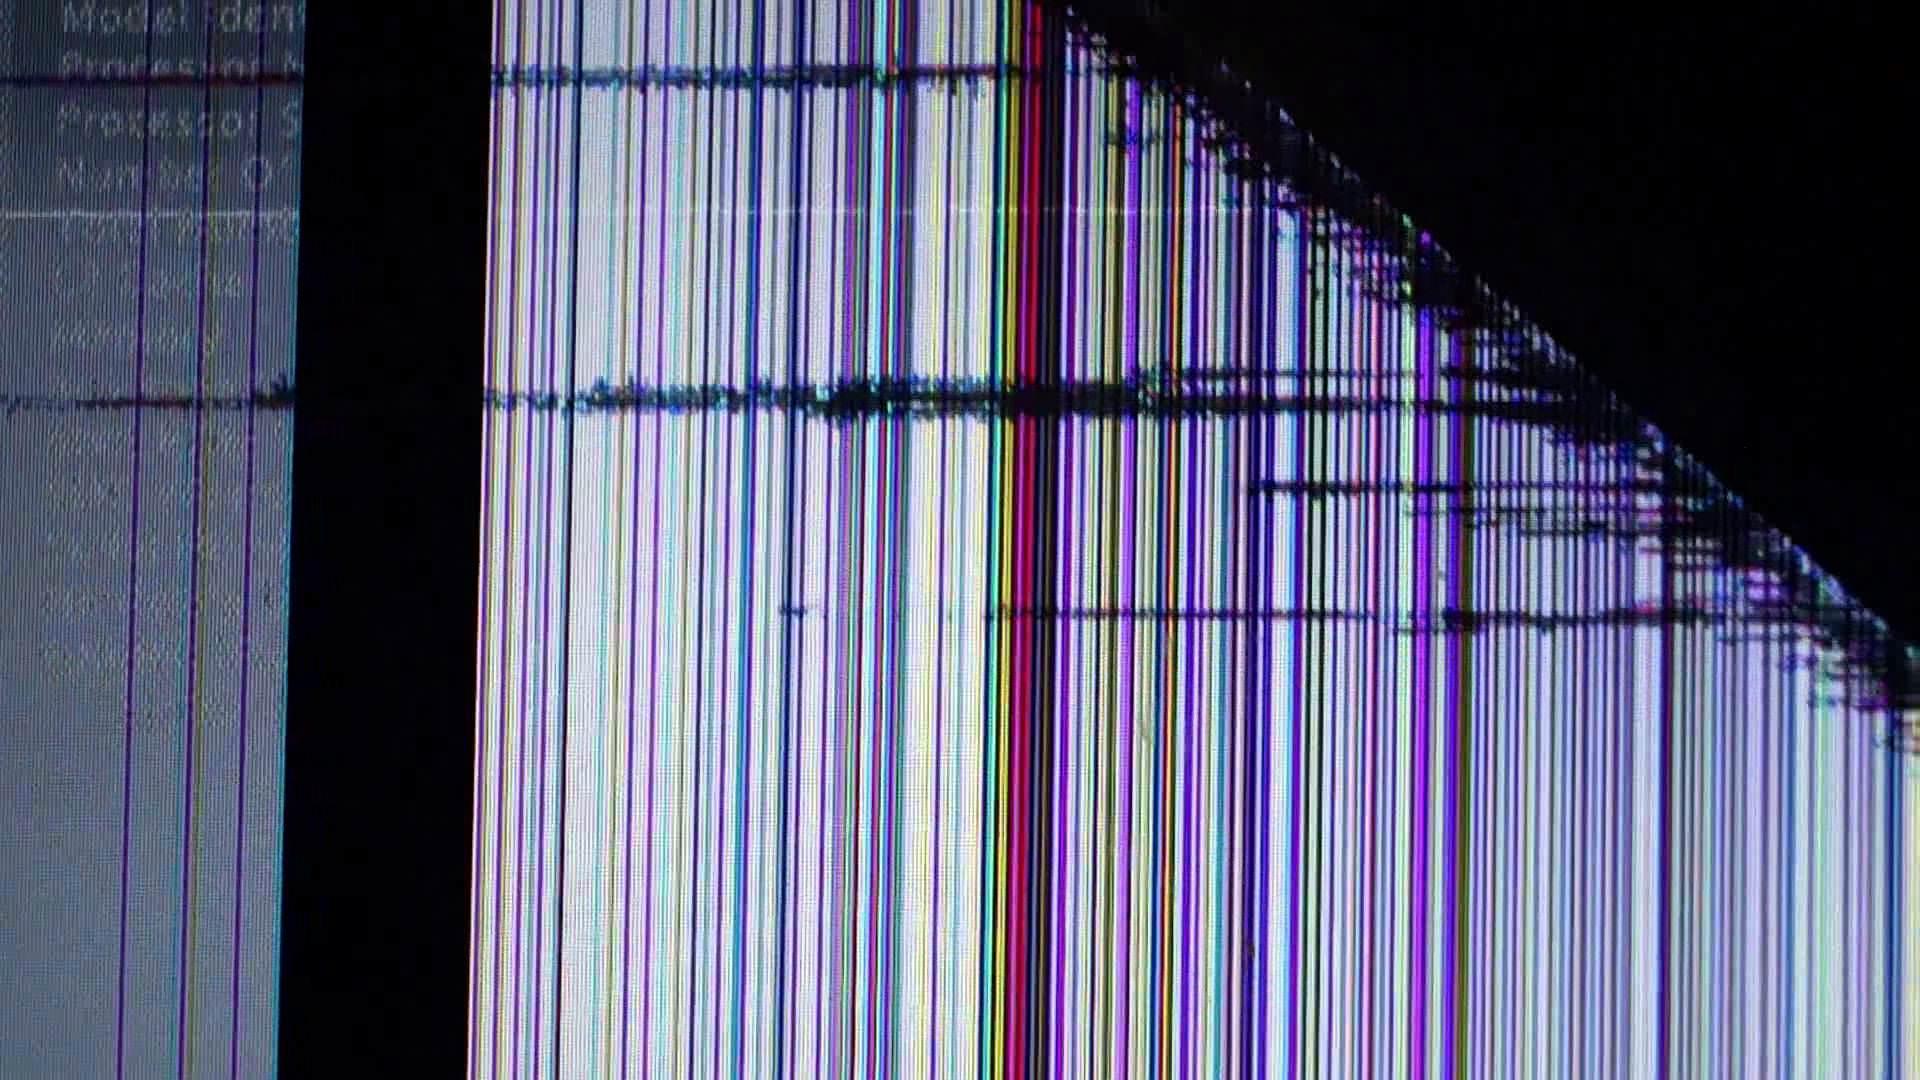 broken-screen-cracked-screen-prank-on-the-App-Store-wallpaper-wpc9003204